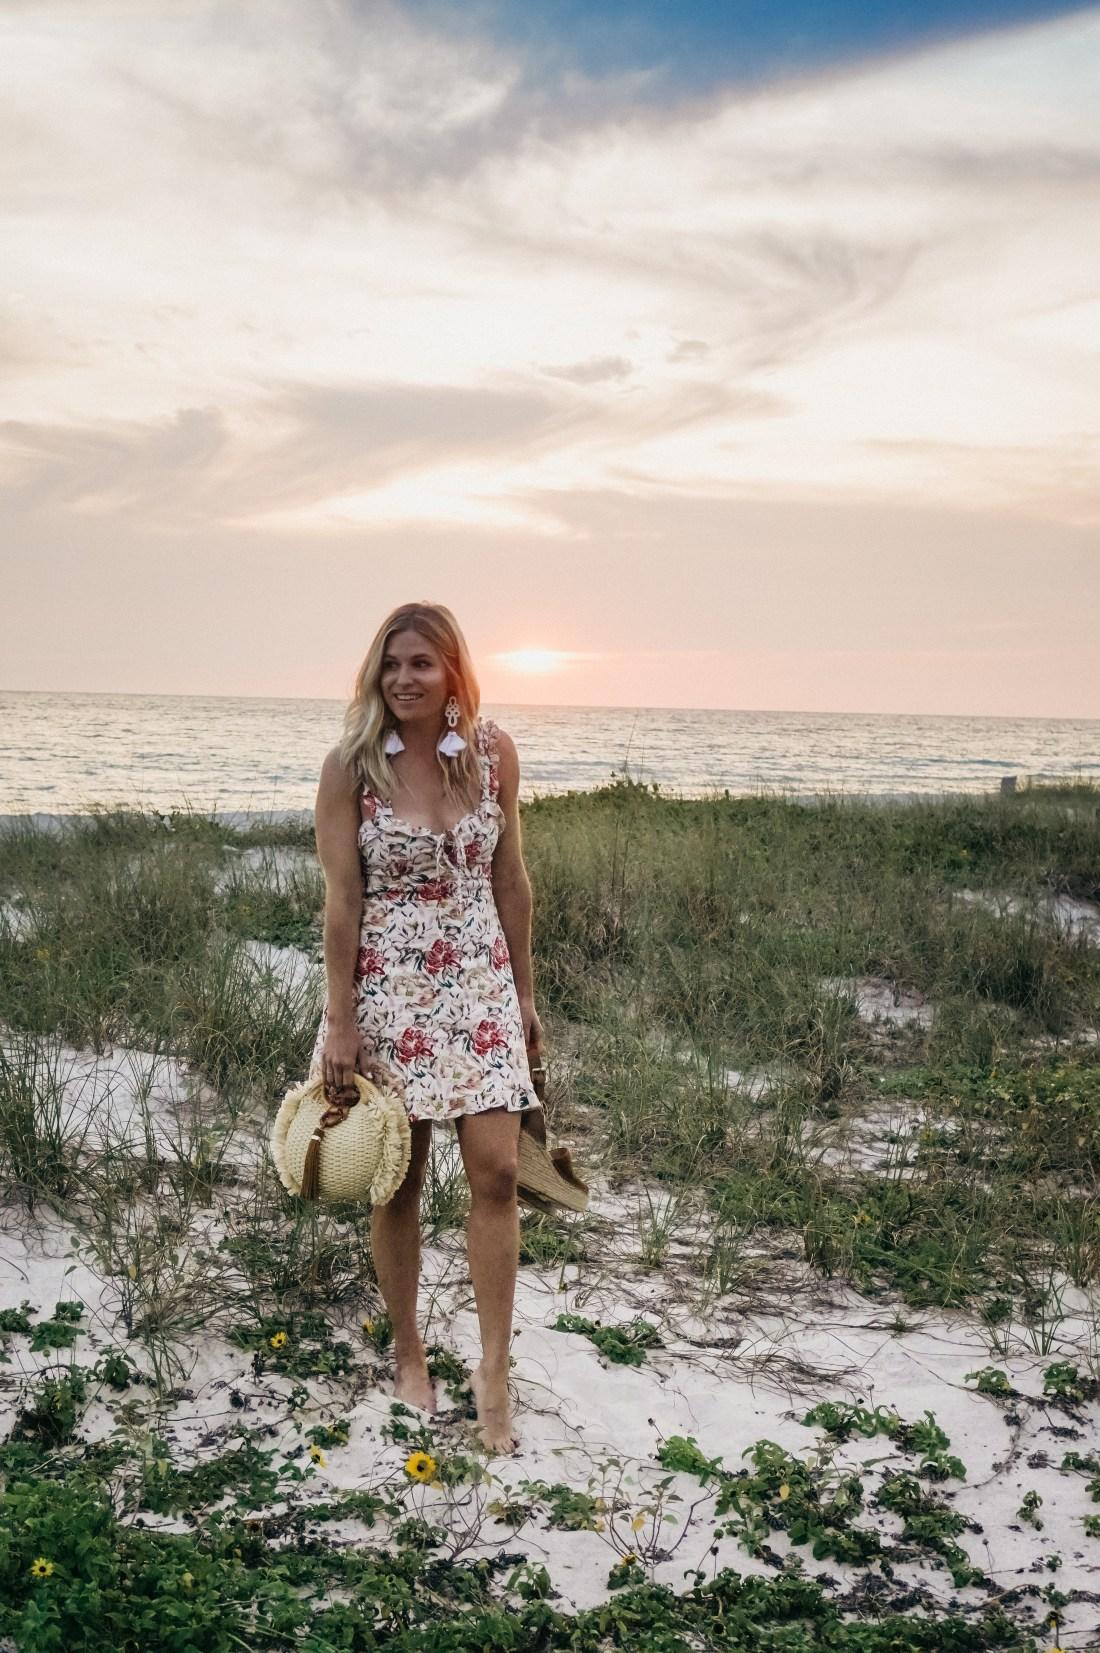 Brooke Burnett wearing floral mini dress on Florida beach